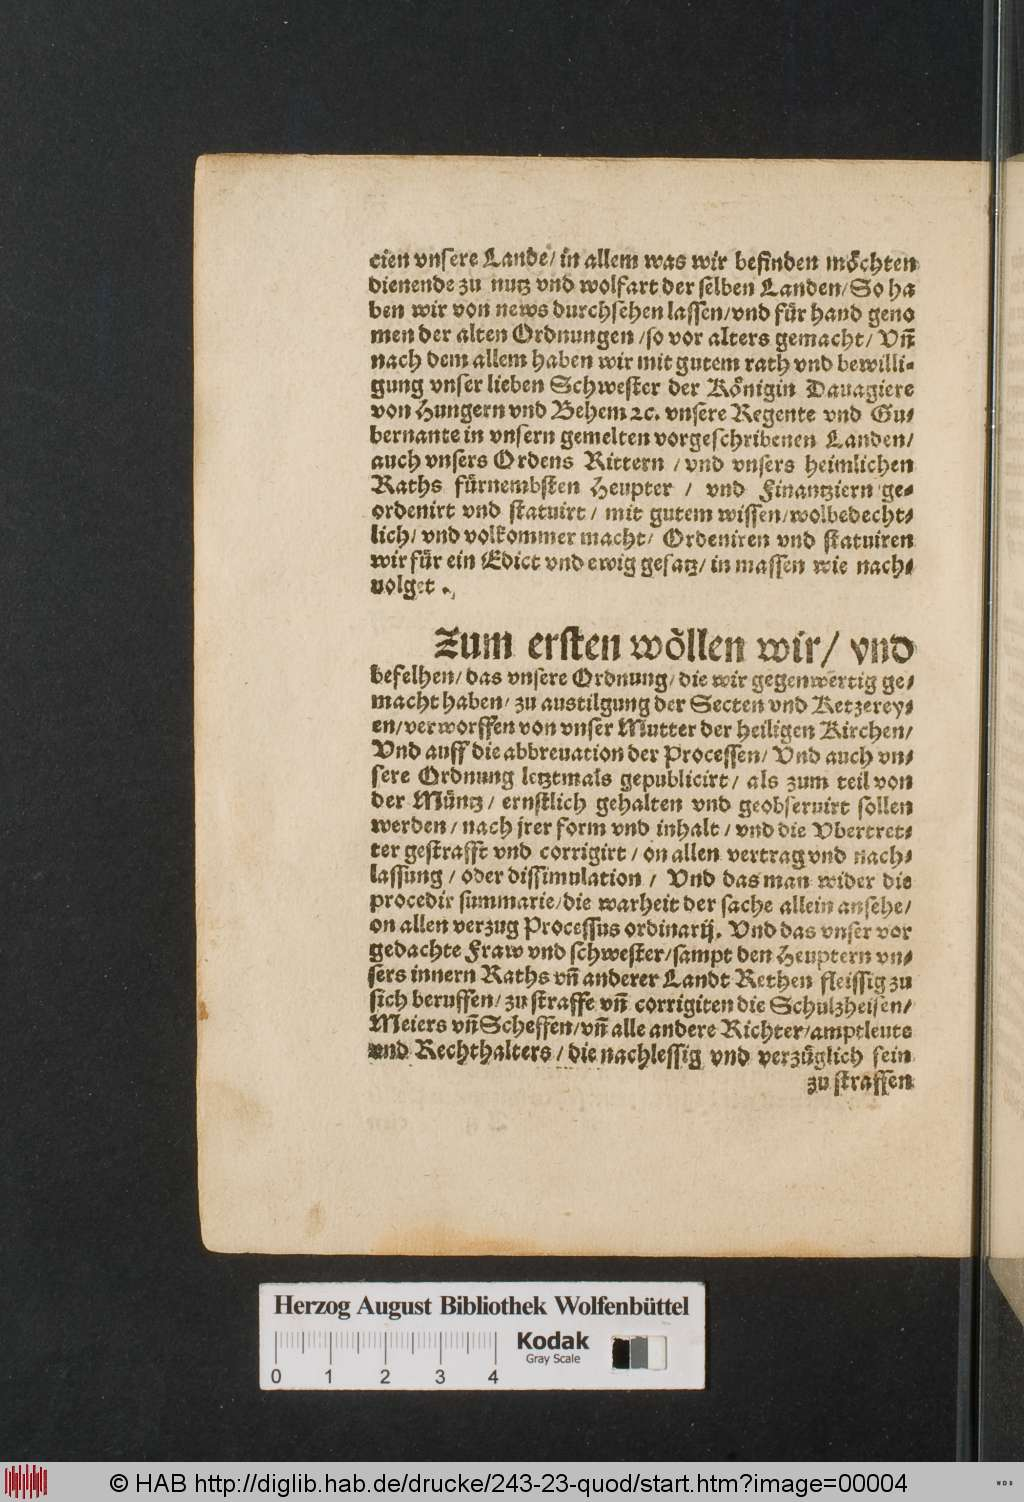 http://diglib.hab.de/drucke/243-23-quod/00004.jpg